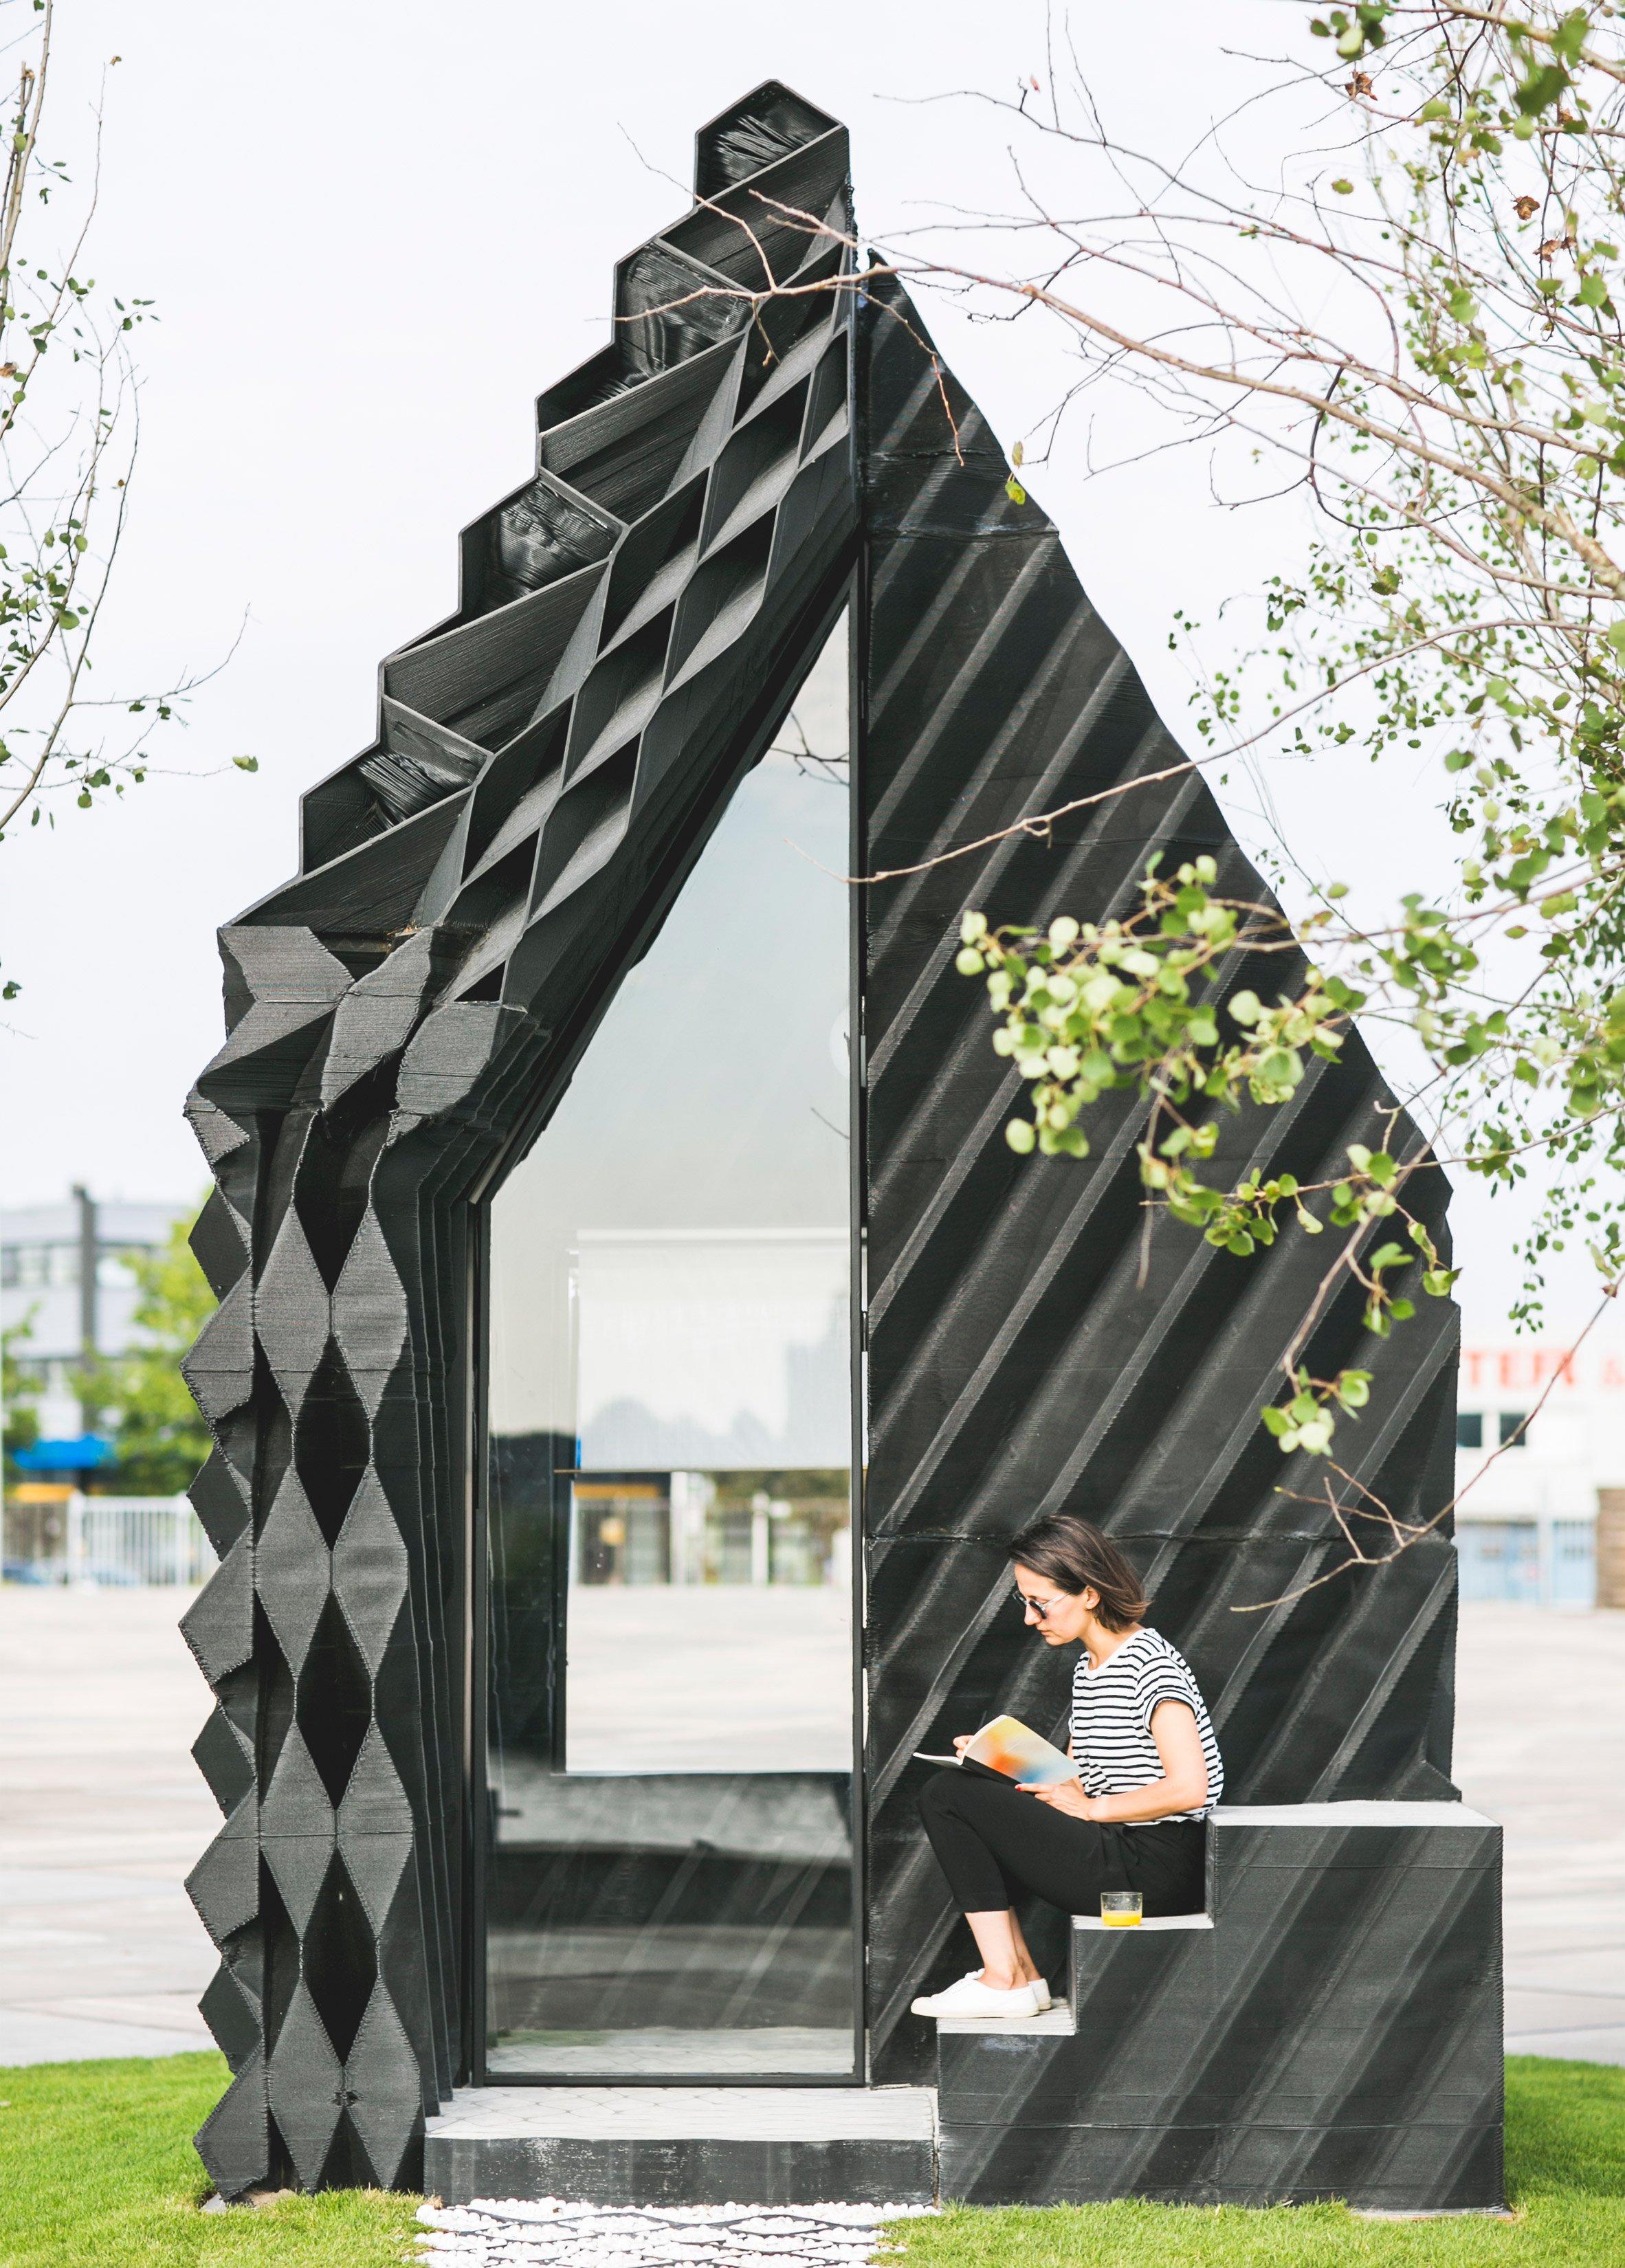 3d-printed-urban-cabin-dus-architects-amsterdam_dezeen_2364_col_2.jpg